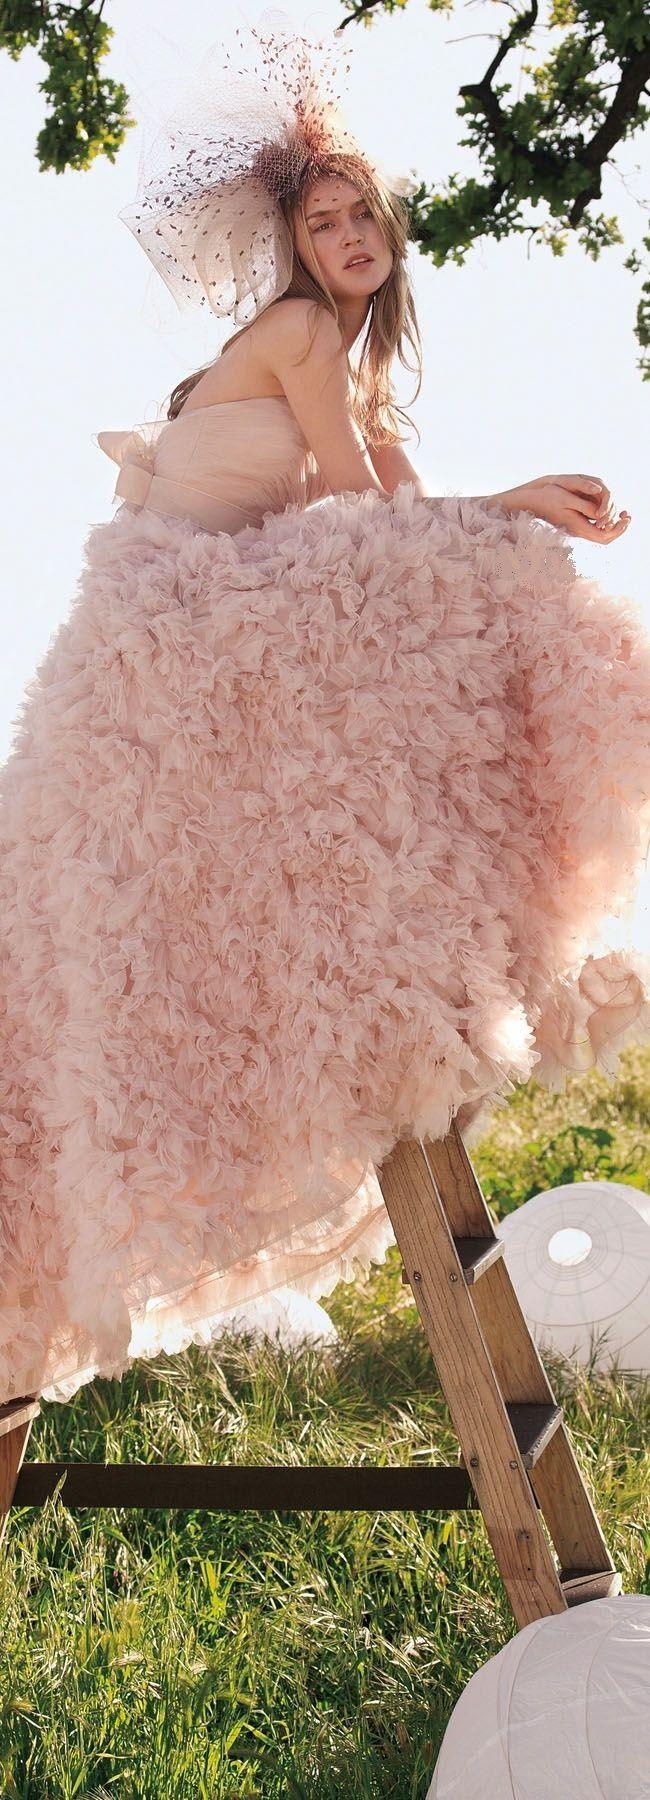 Pink Ruffled Dress | 15 | Pinterest | Vestidos boda, Novios y Boda